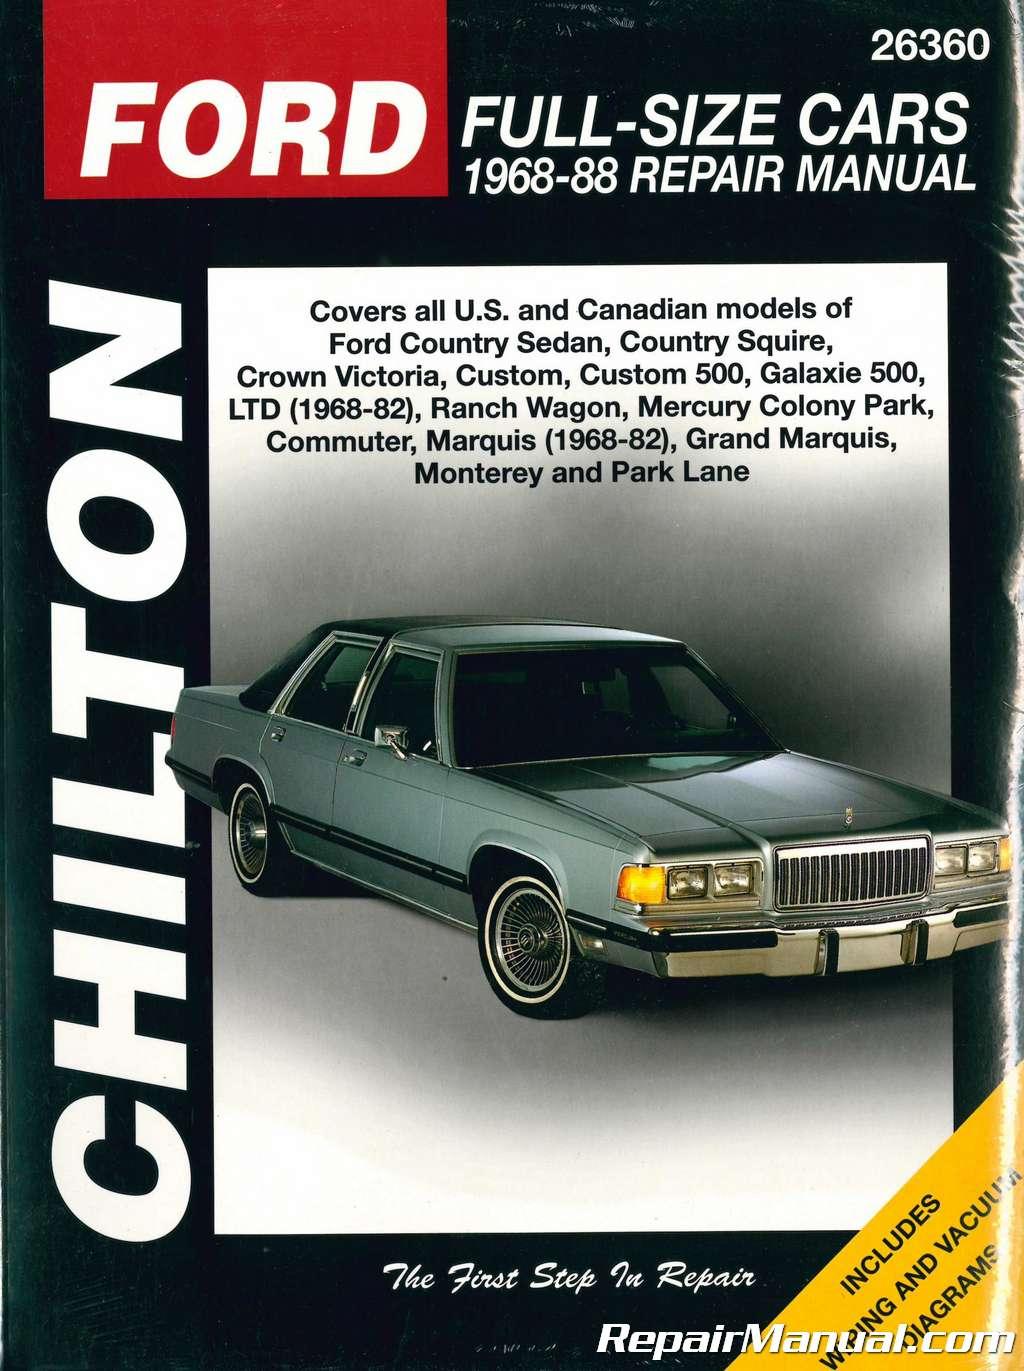 Chilton Ford Full Size Cars Repair Manual